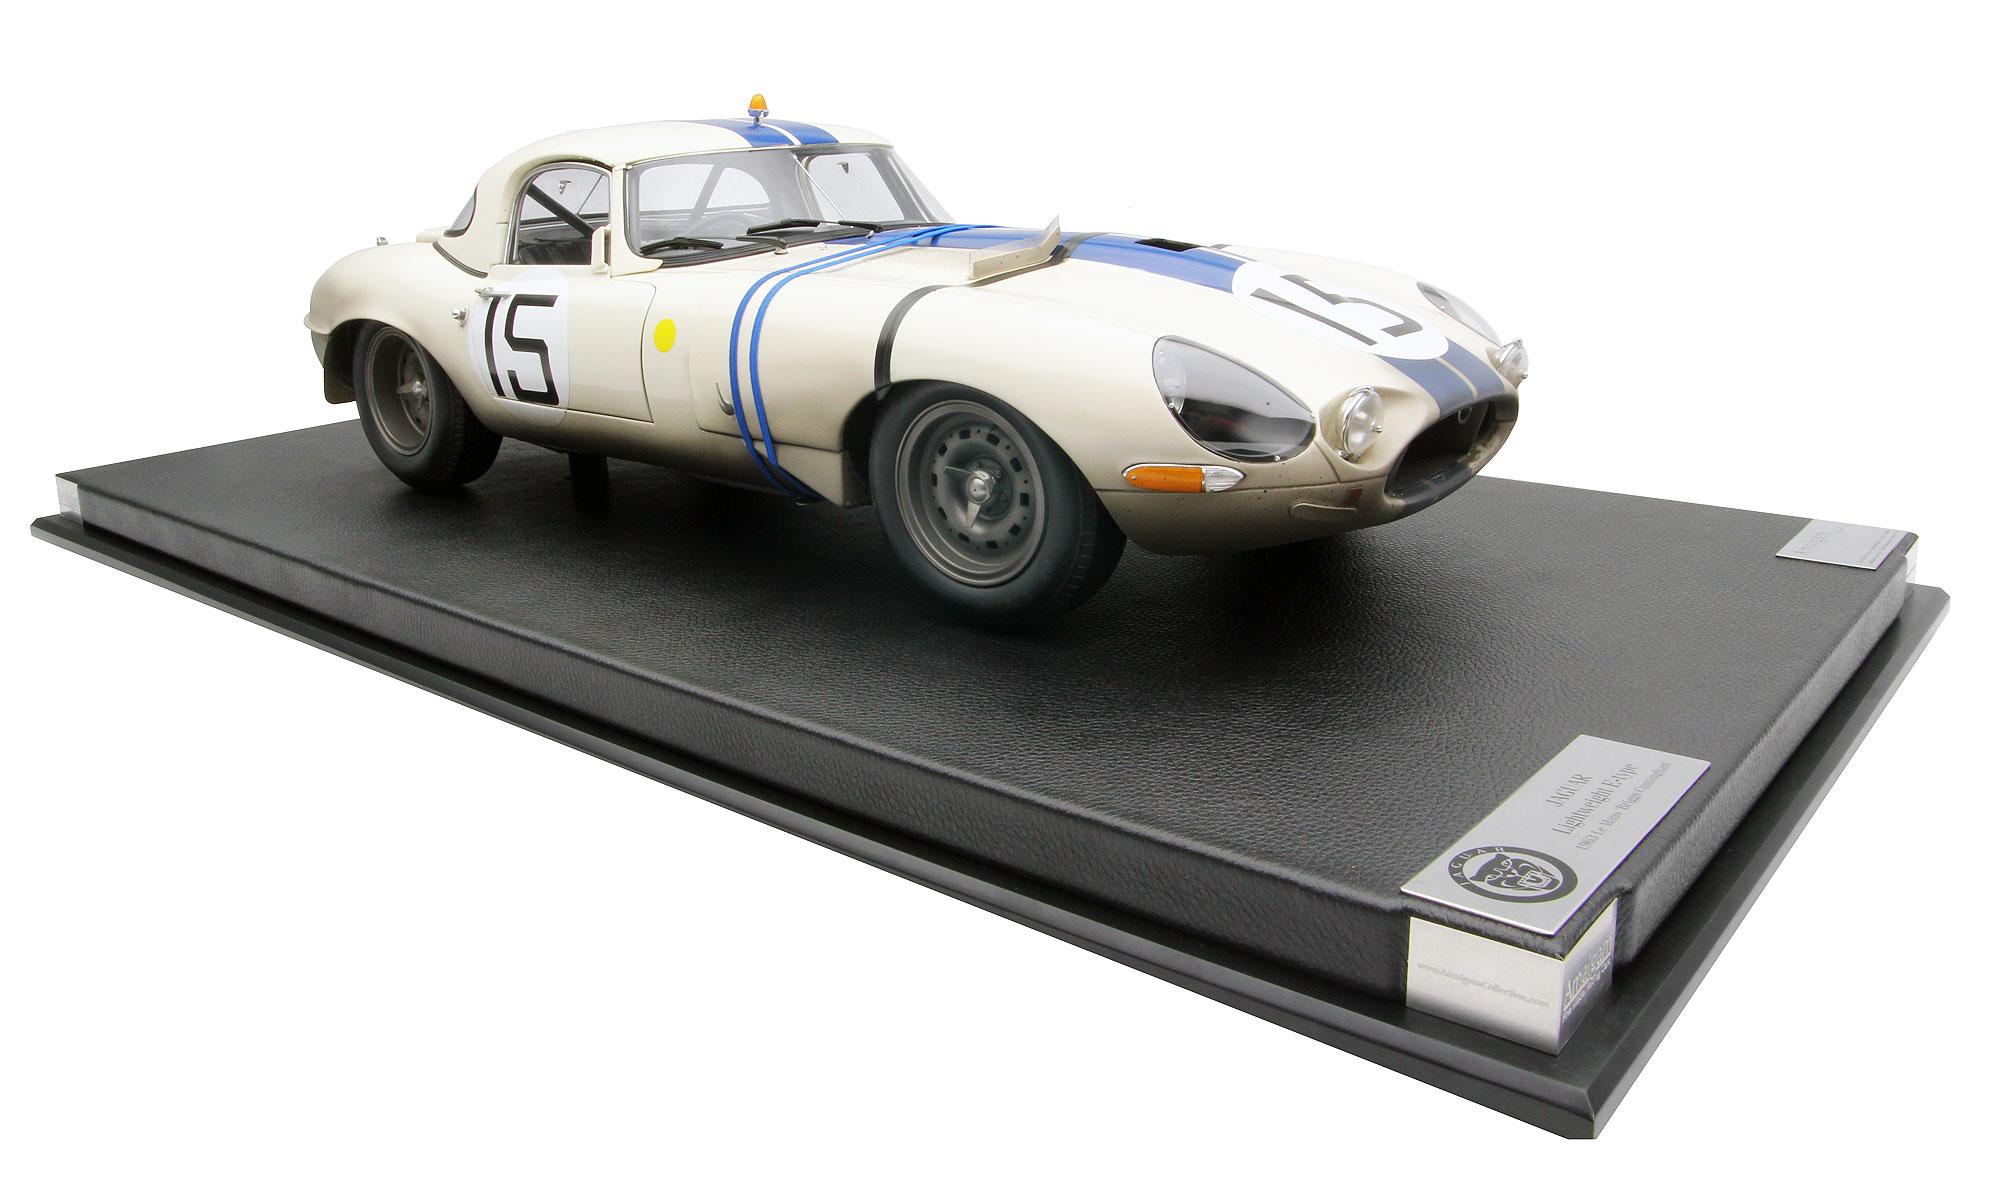 Jaguar E-Type 1963 Briggs Cunningham Le Mans racing car